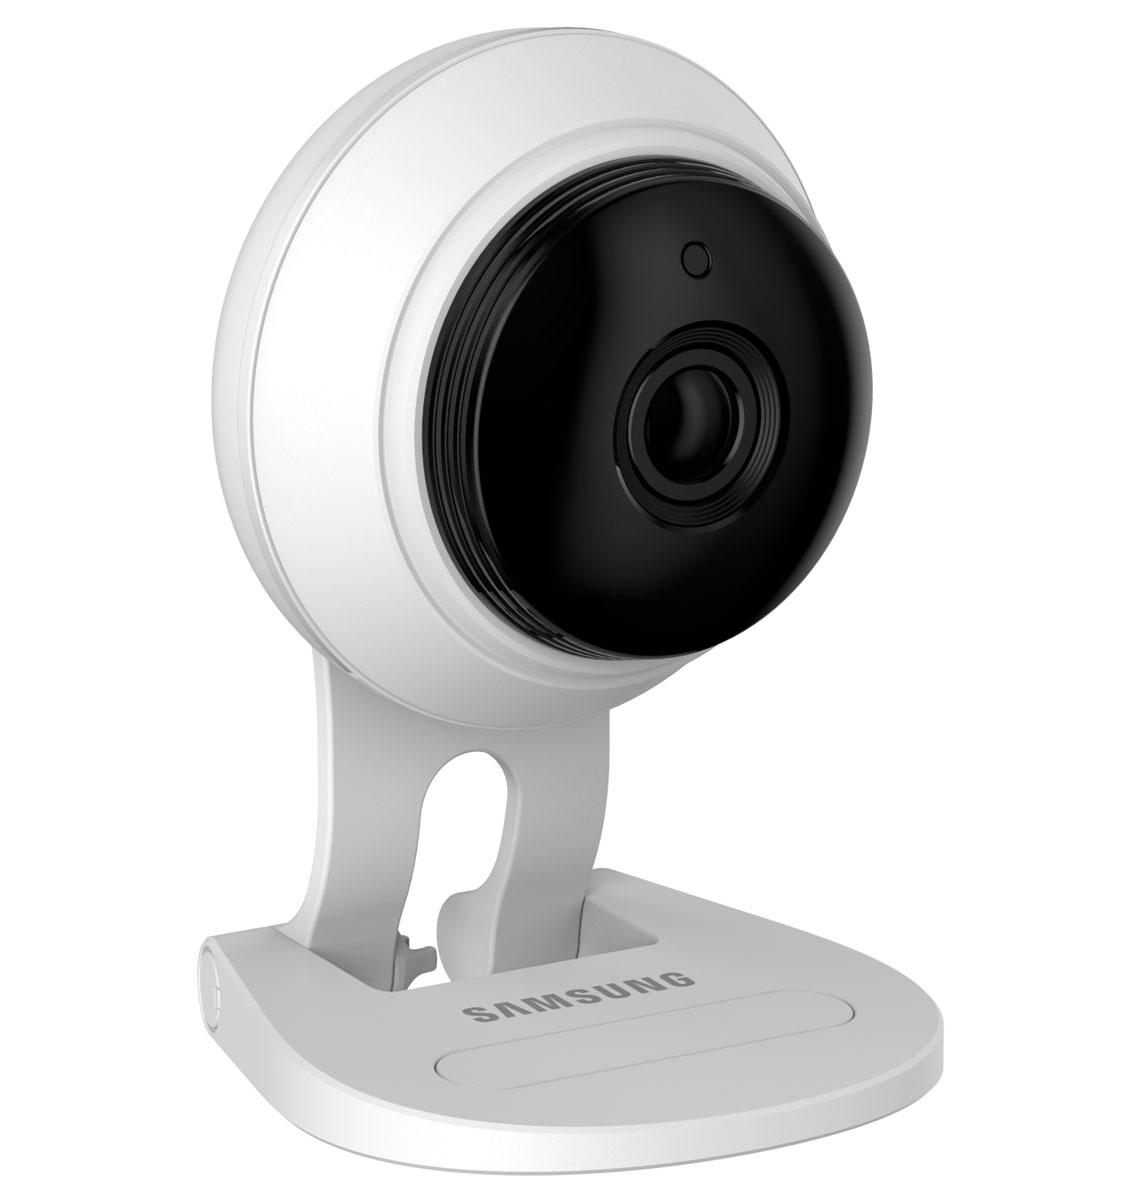 Samsung Видеоняня SmartCam SNH-C6417BN видеоняня samsung smartcam snh c6417bn